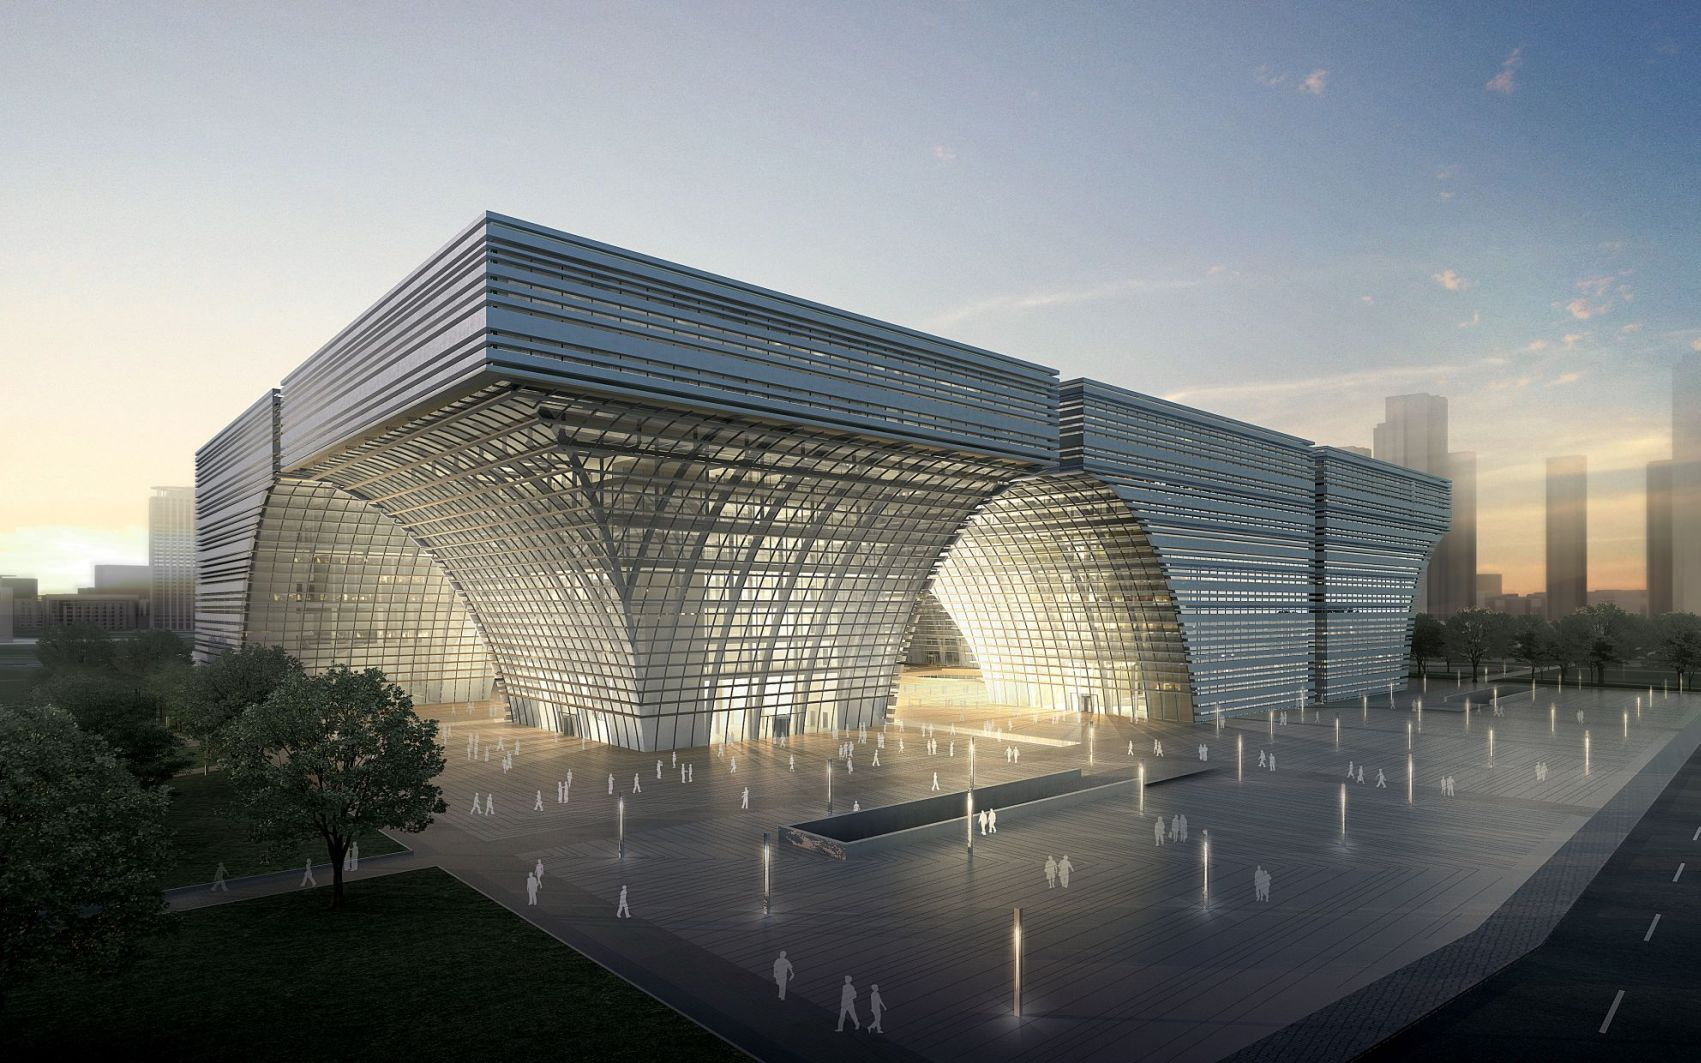 1° Lugar: Concurso Internacional Centro Cultural Changzhou / gmp Architekten, © Crystal Digital Technology